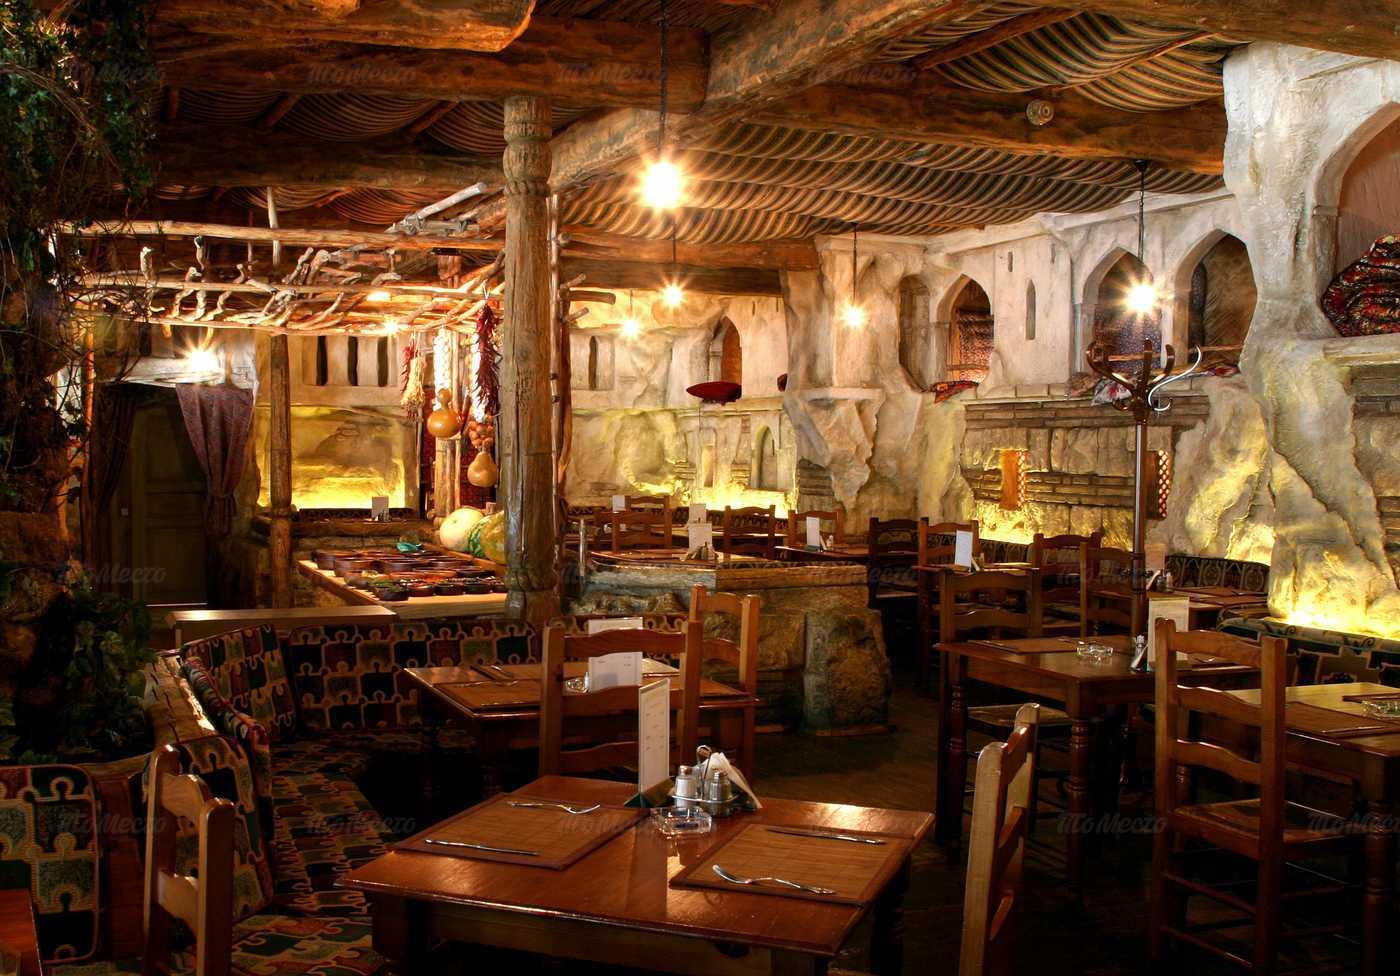 Меню ресторана Киш-Миш (Чайхана Киш-Миш) на улице 1905 года